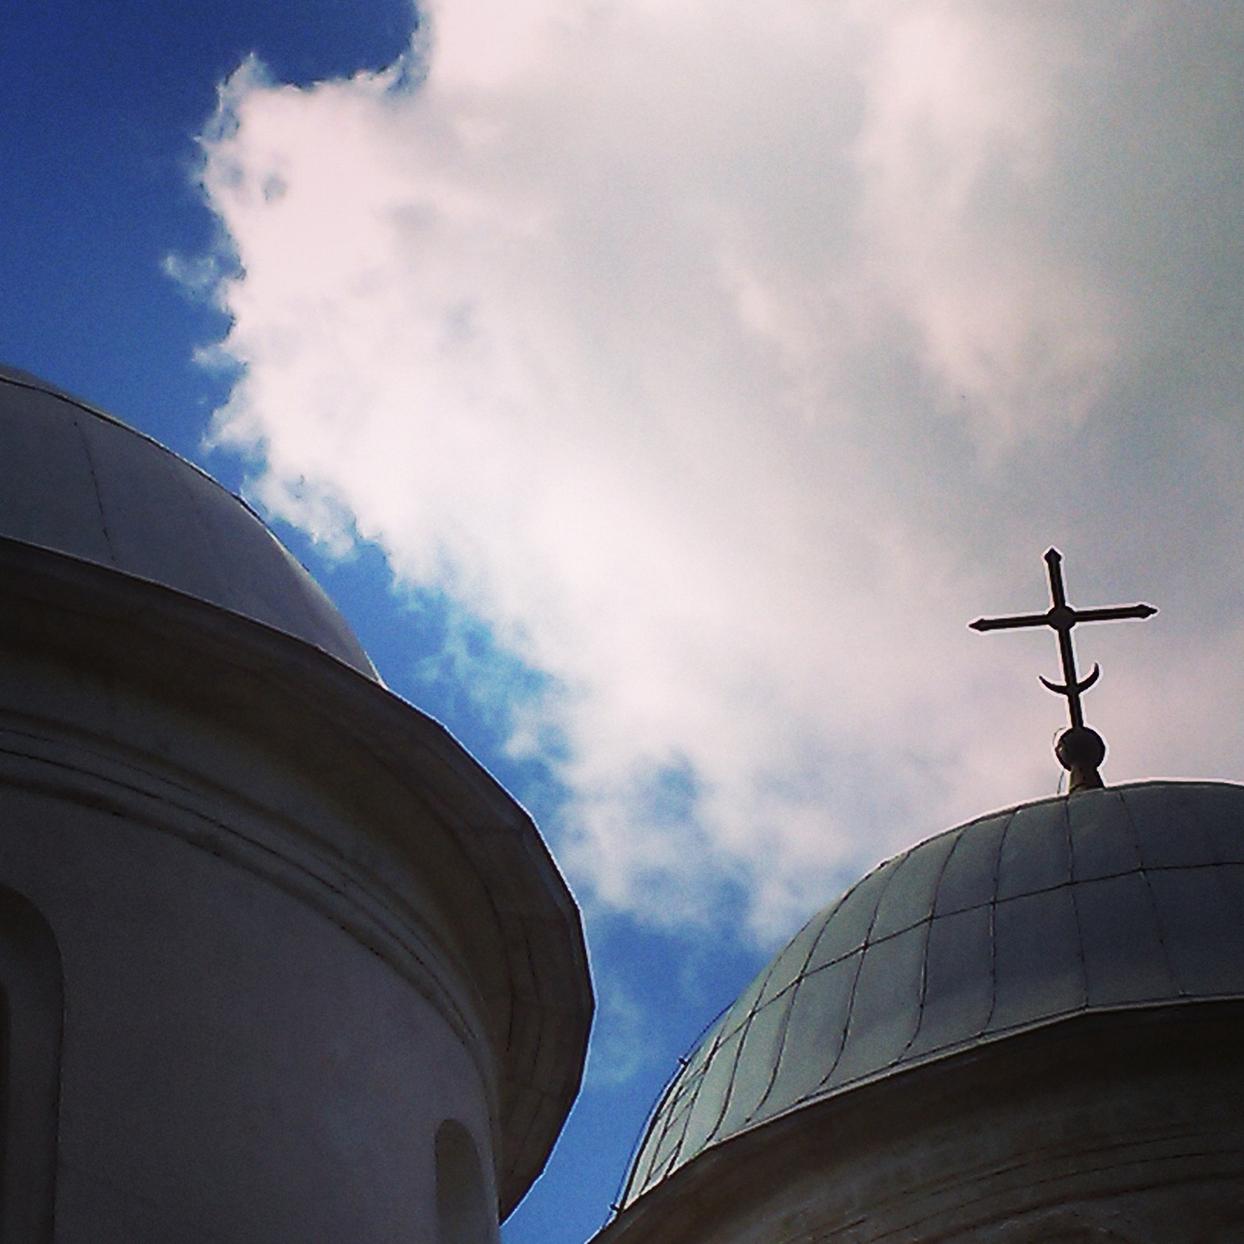 Ivangorod: Spiritual Fathers